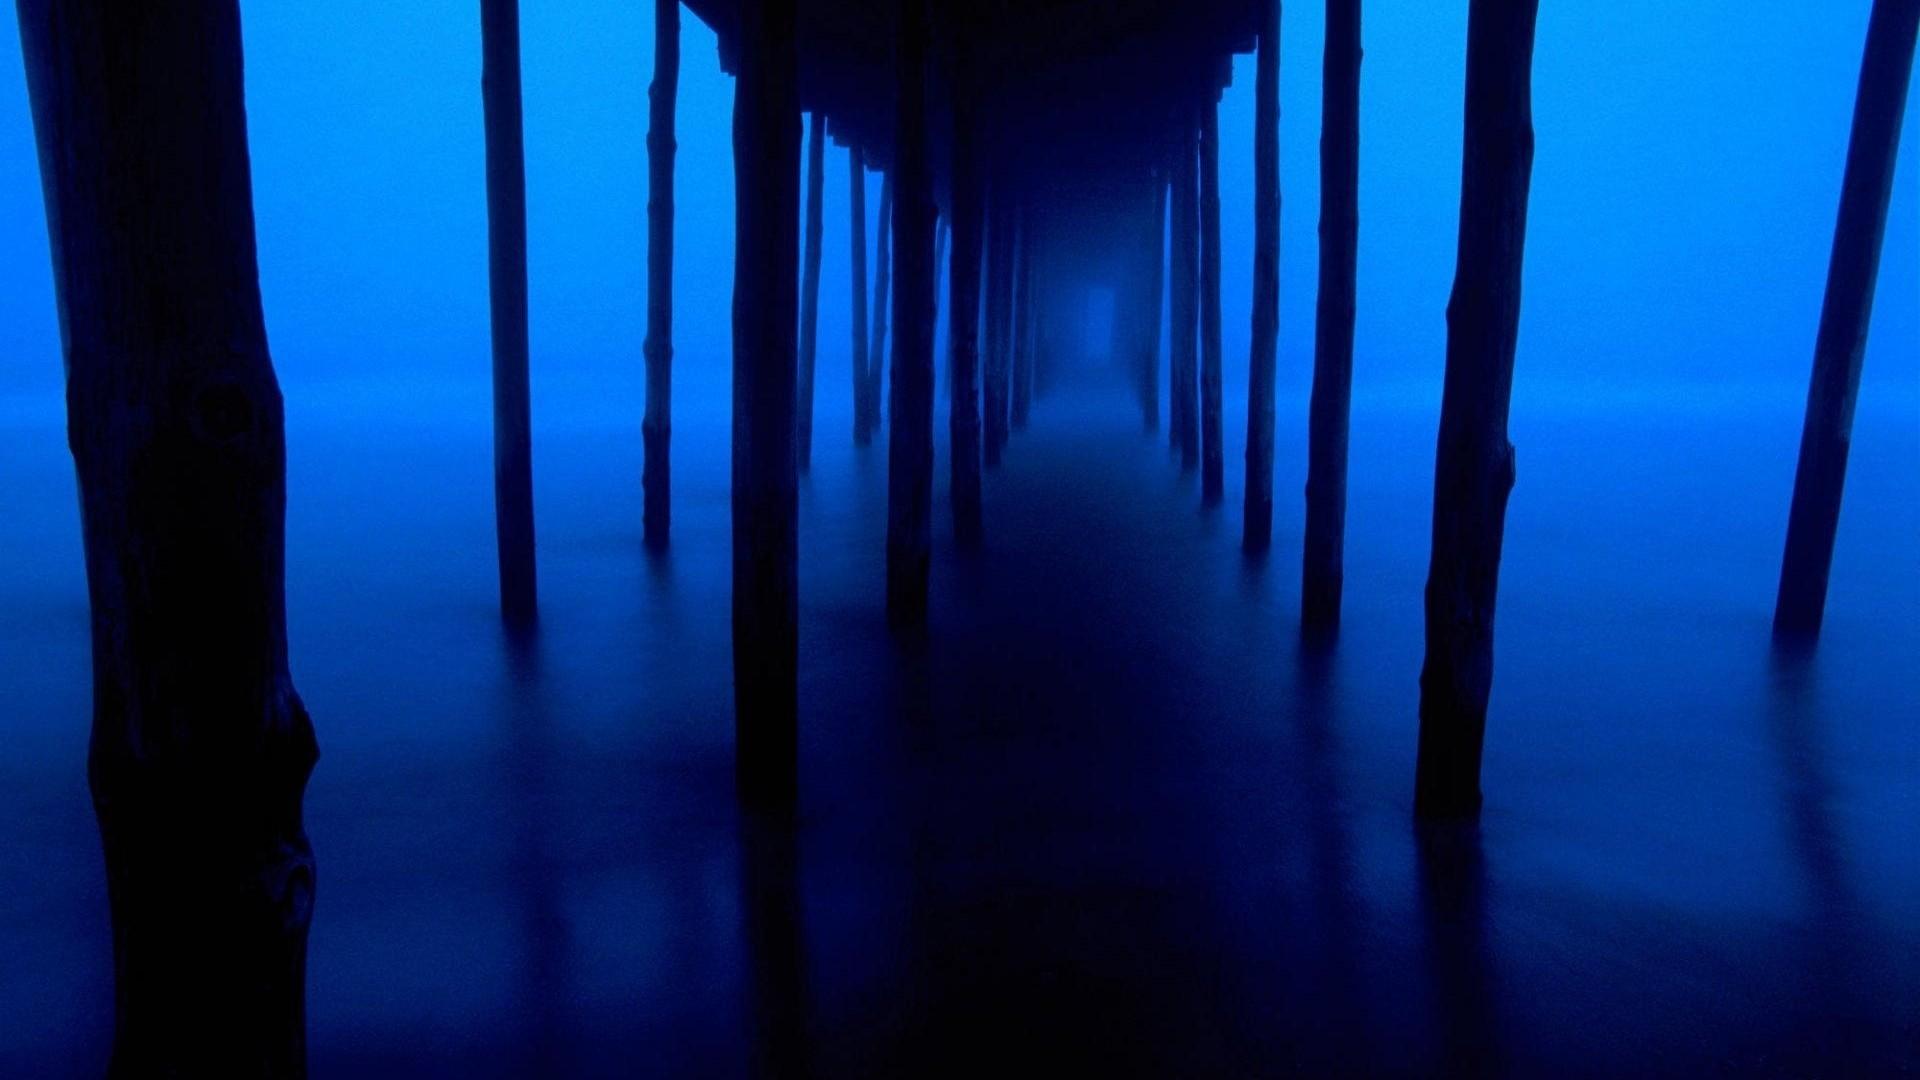 Preview wallpaper dark blue, support, bridge, mysterious 1920×1080